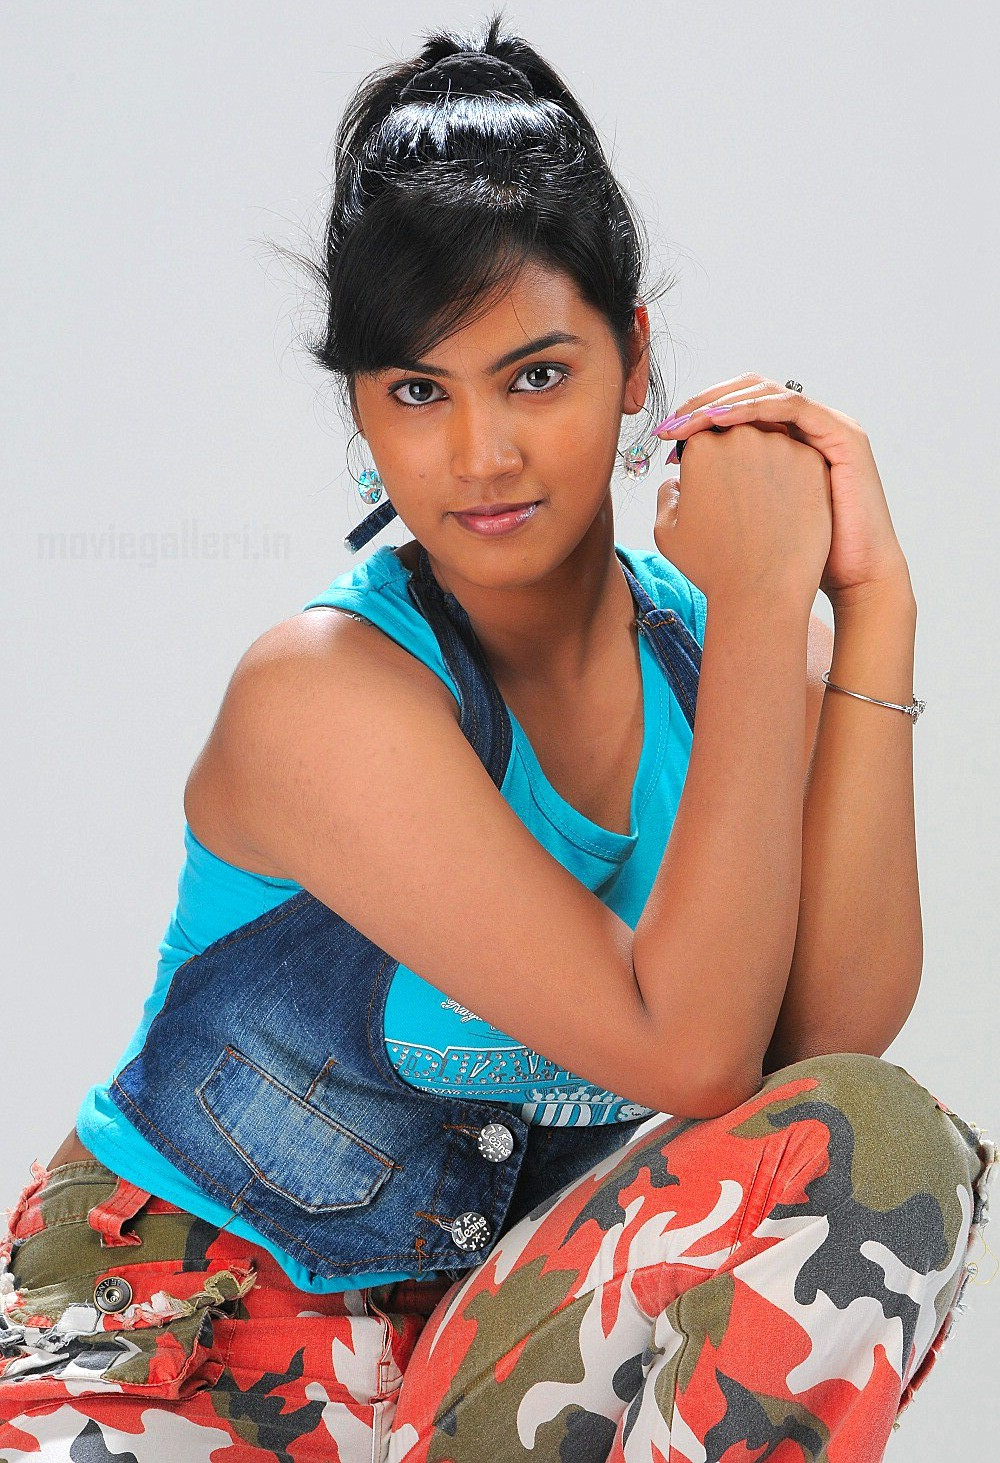 actress harika telugu tv wallpapers stills latest serial vaishali shoot please